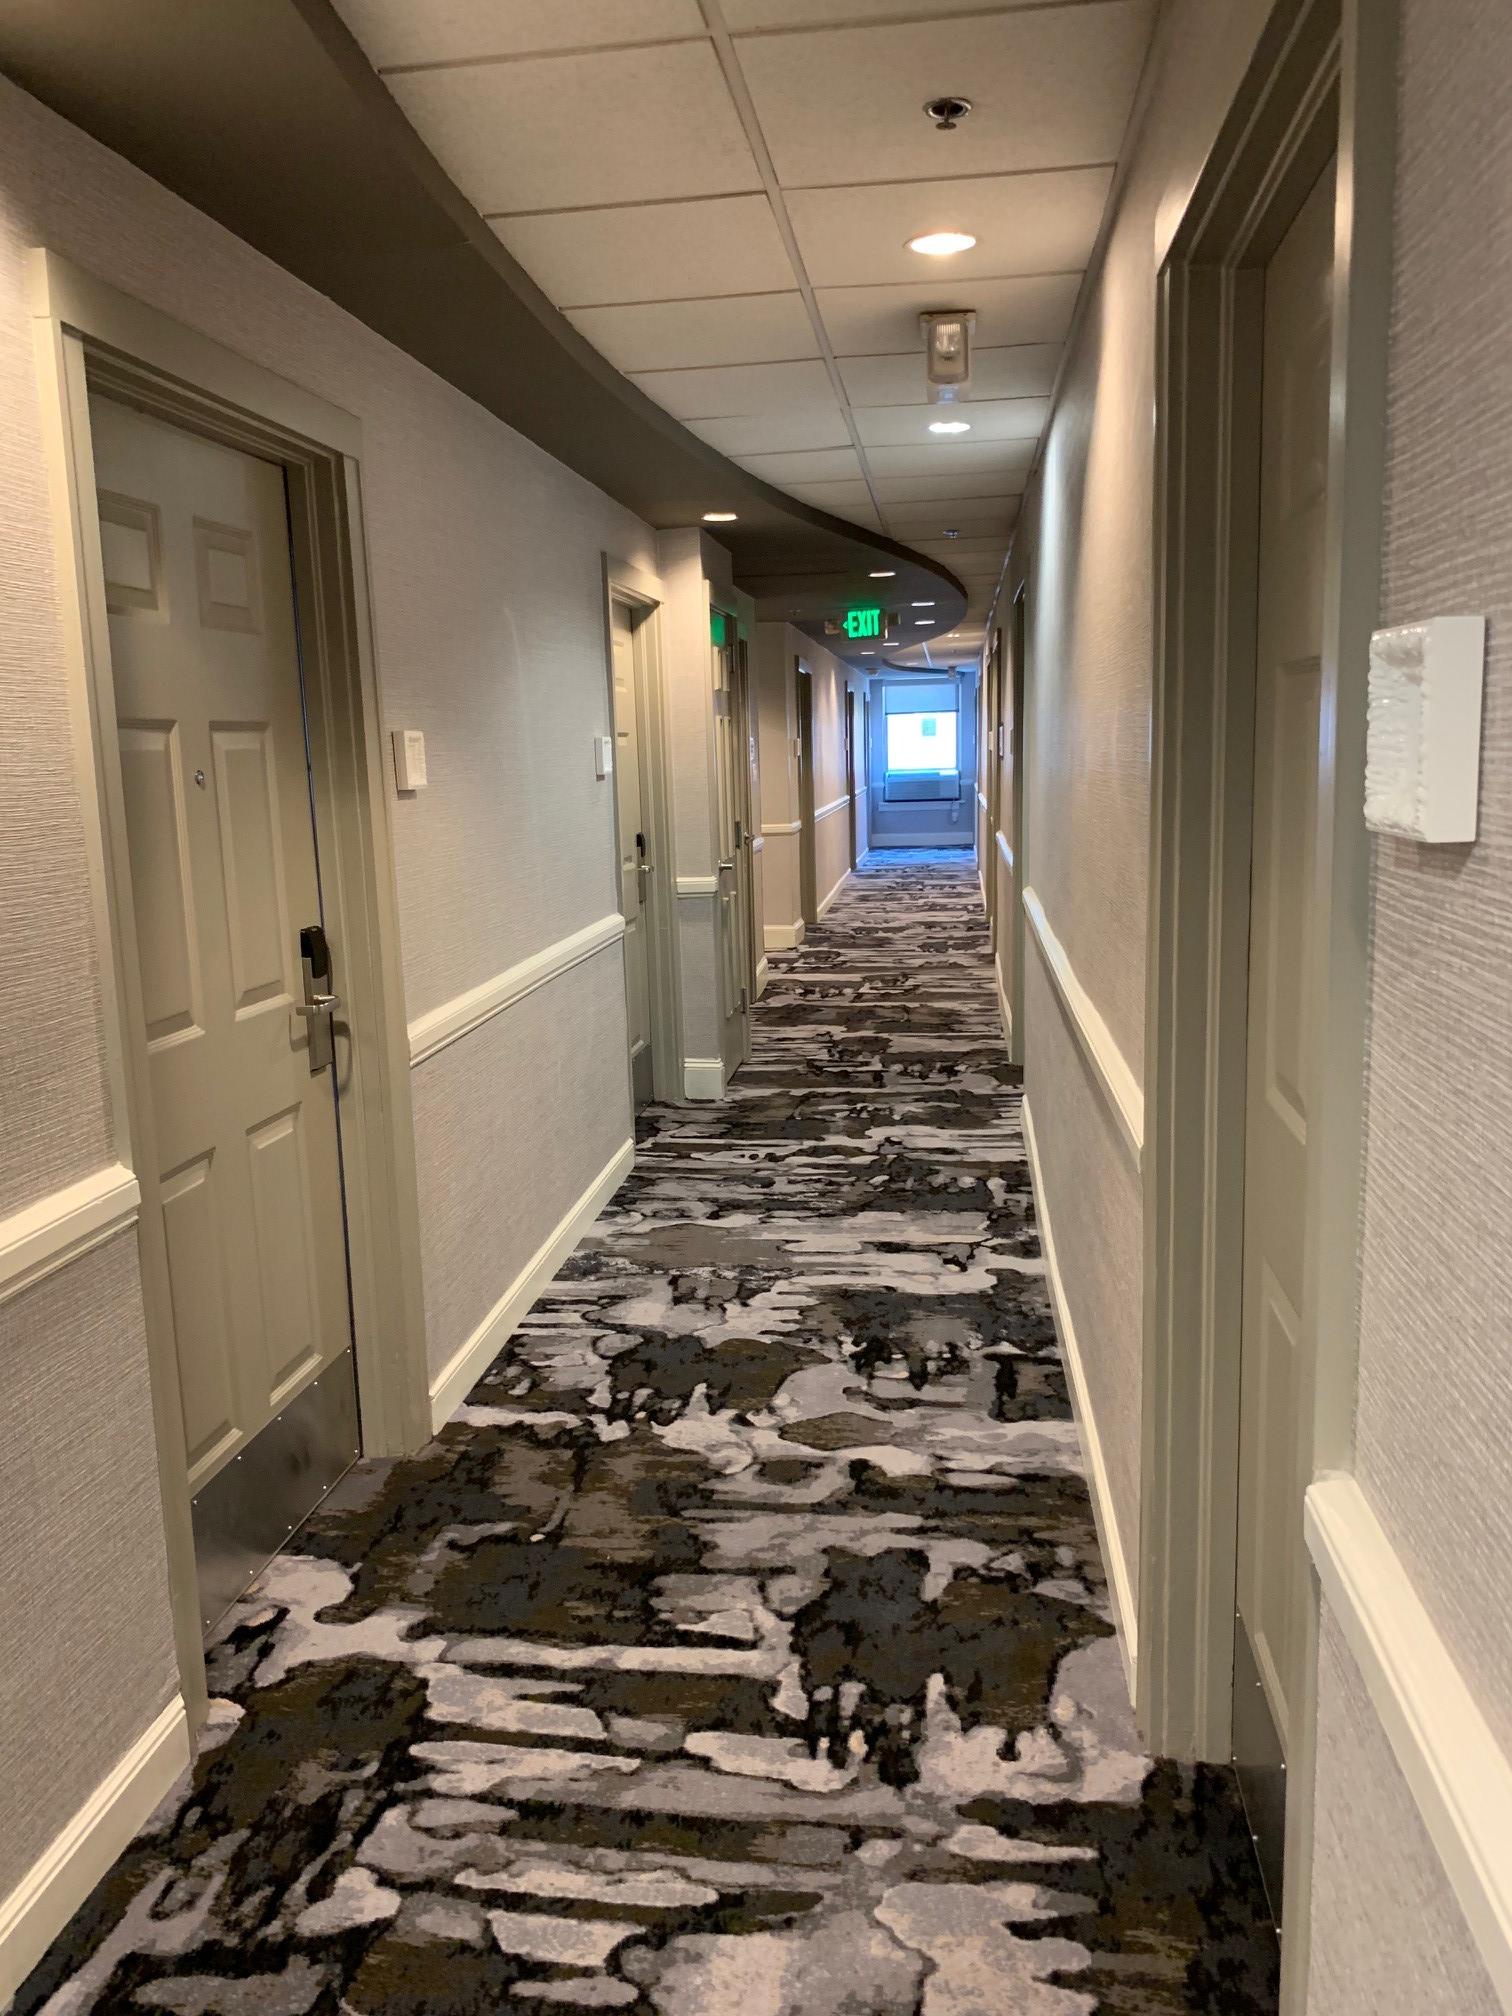 Hotel Indigo hallway